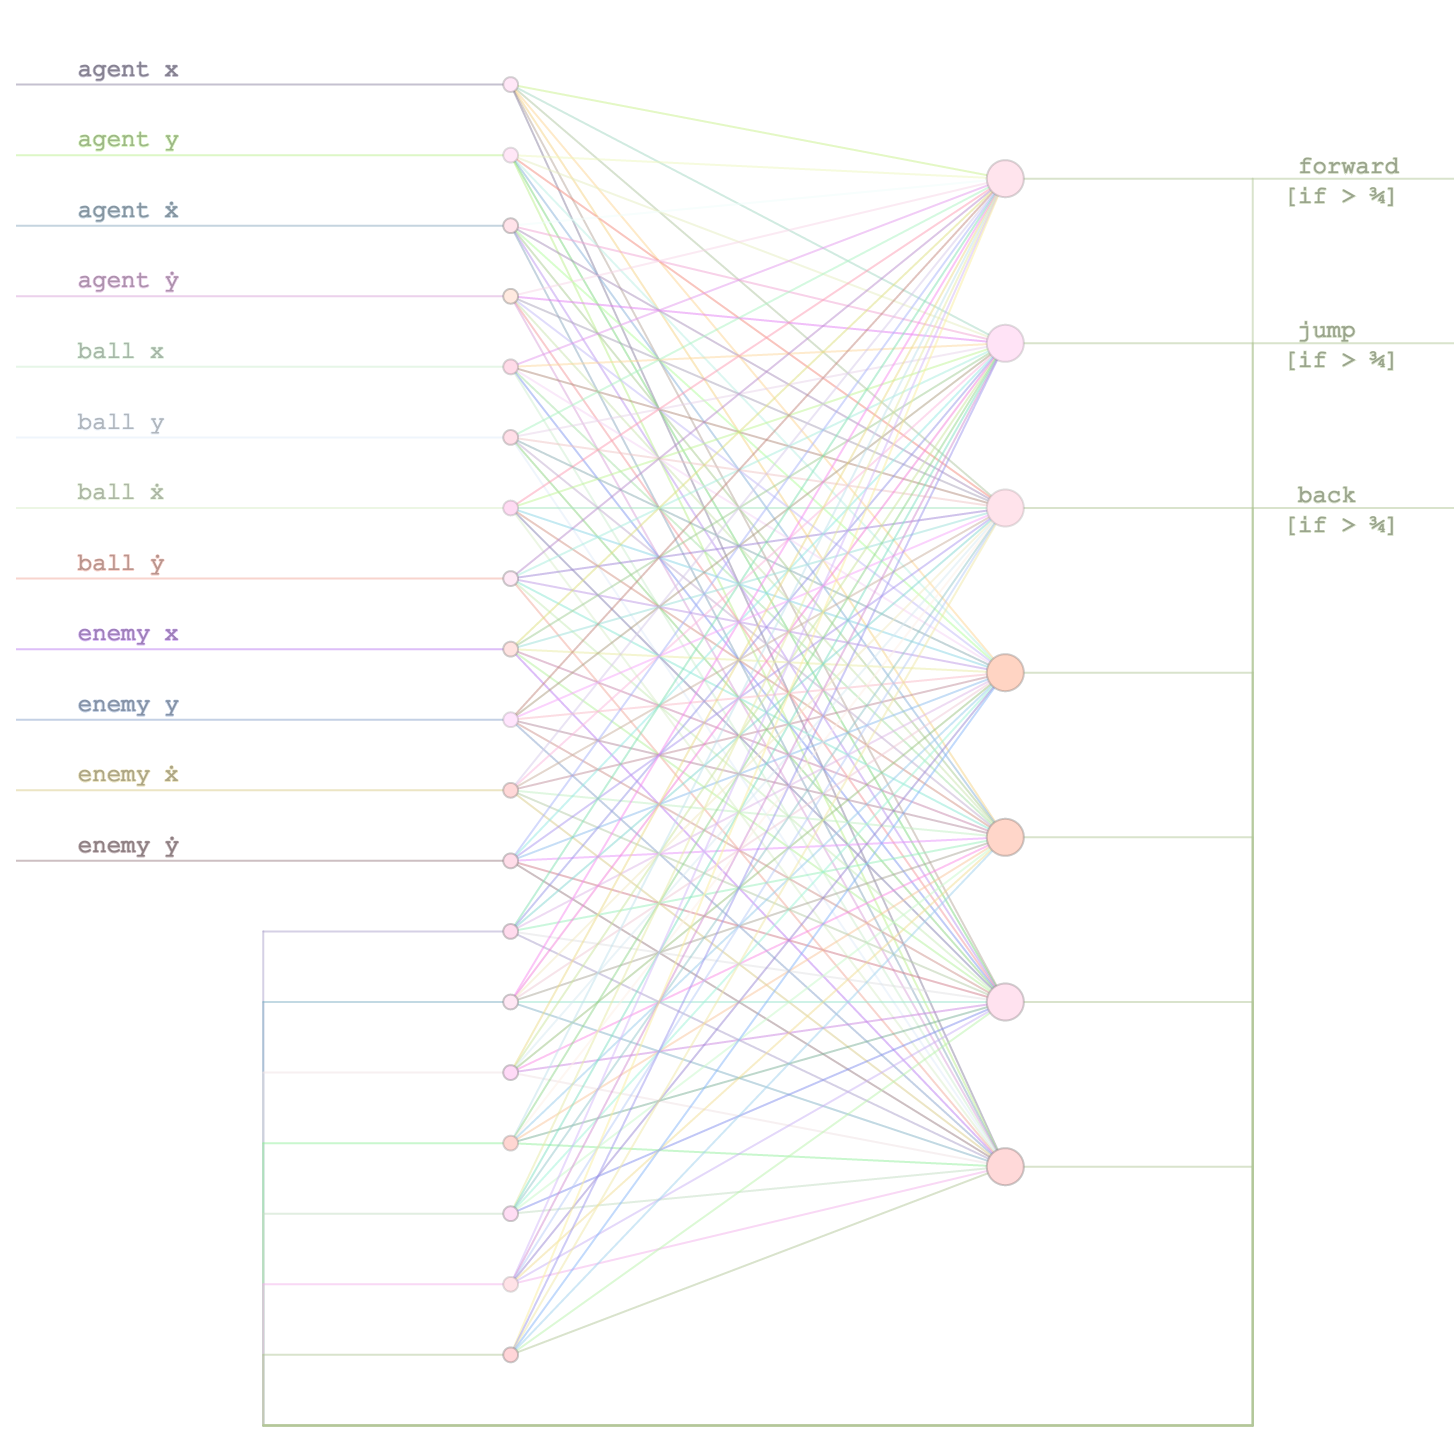 show hn  recurrent neural net plays  u0026 39 neural slime